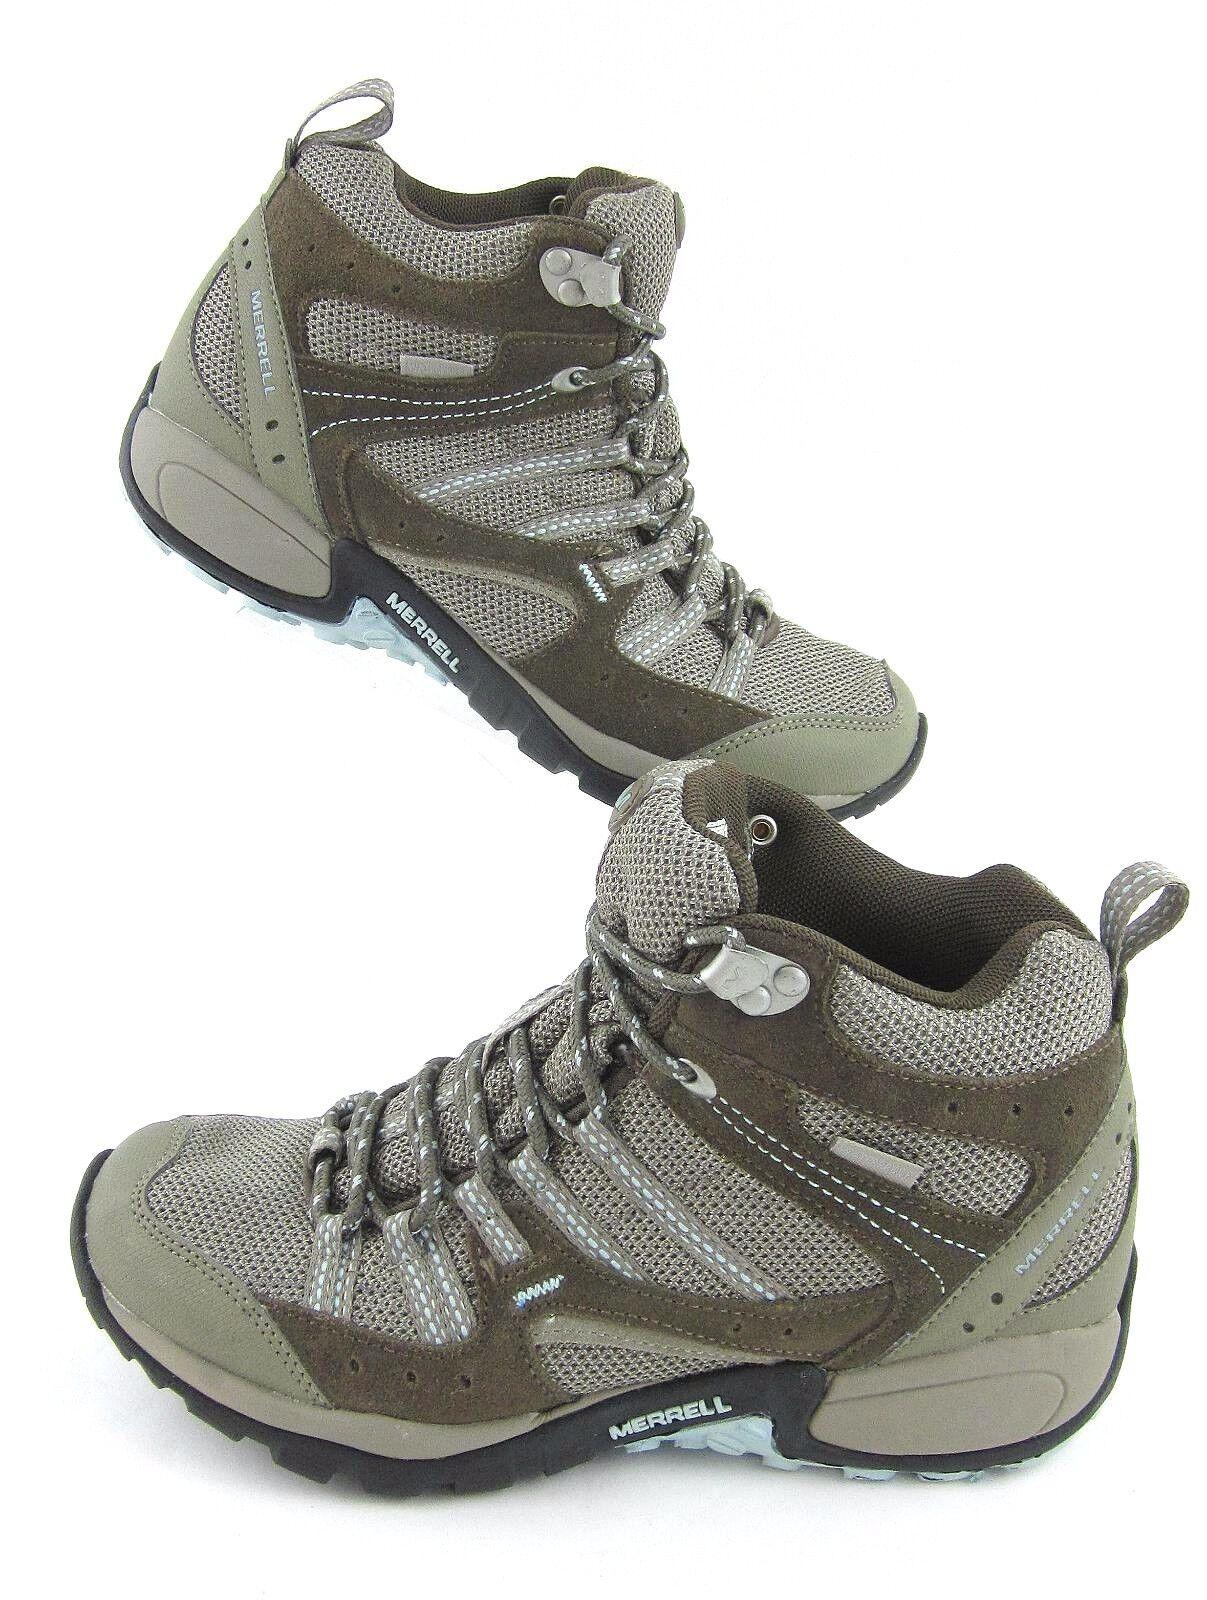 Merrell Tuskora Mid Waterproof Hiking Trail Stivali Olive Sz 8 Worn Once!